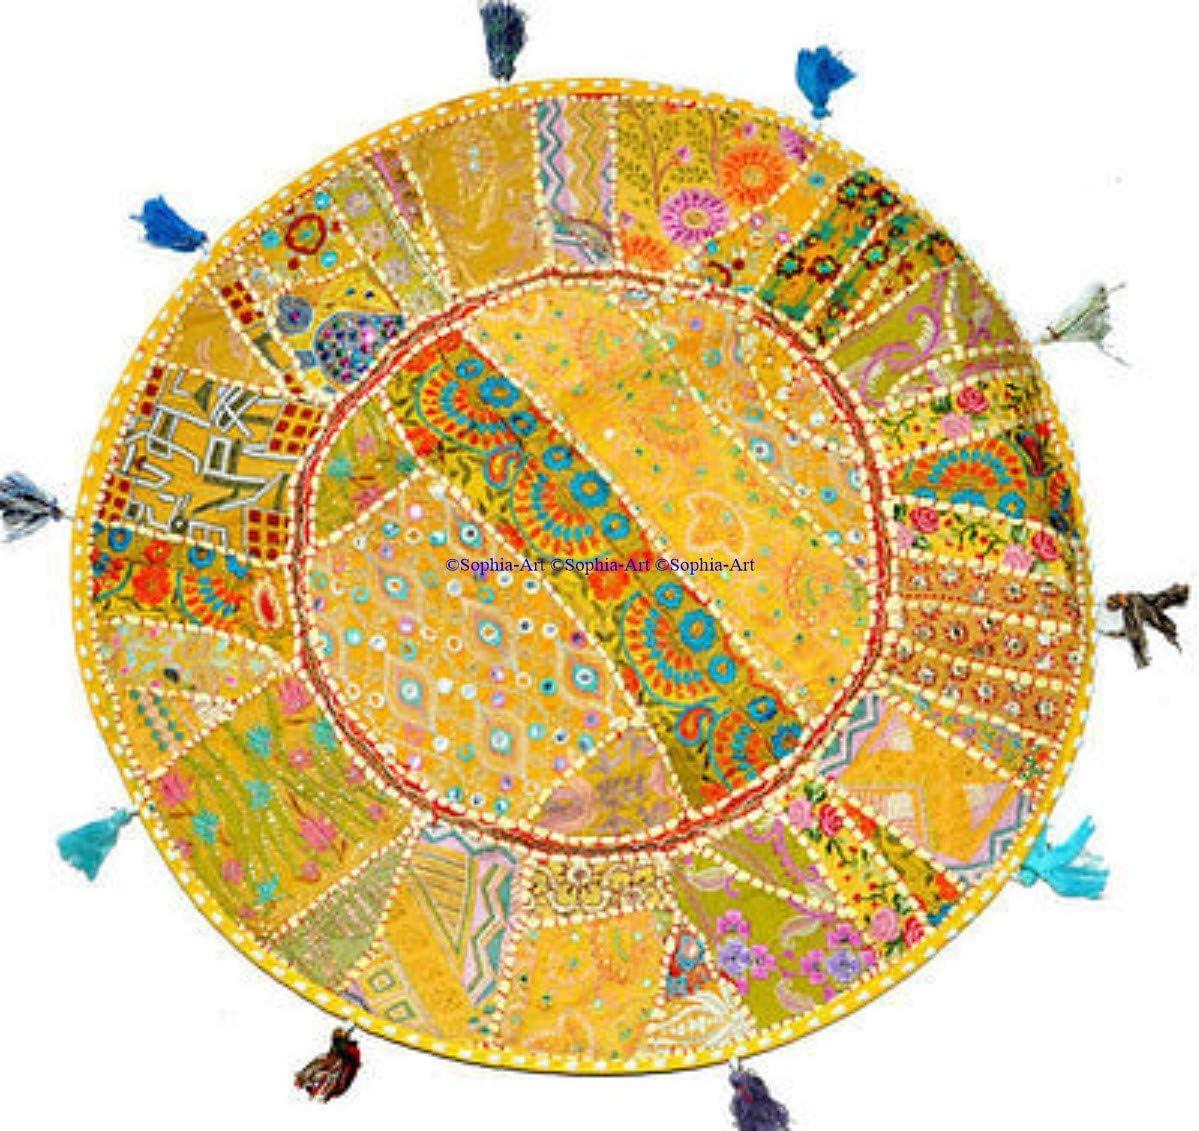 Sophia Art Round Floor Pillow Cushion Patchwork Pouf Ottoman Vintage Indian Foot Stool Bean Bag Floor Pillow Cover Home Decor Living Room Ottoman Bohemain Pillows Lemon Yellow, 40 Inch